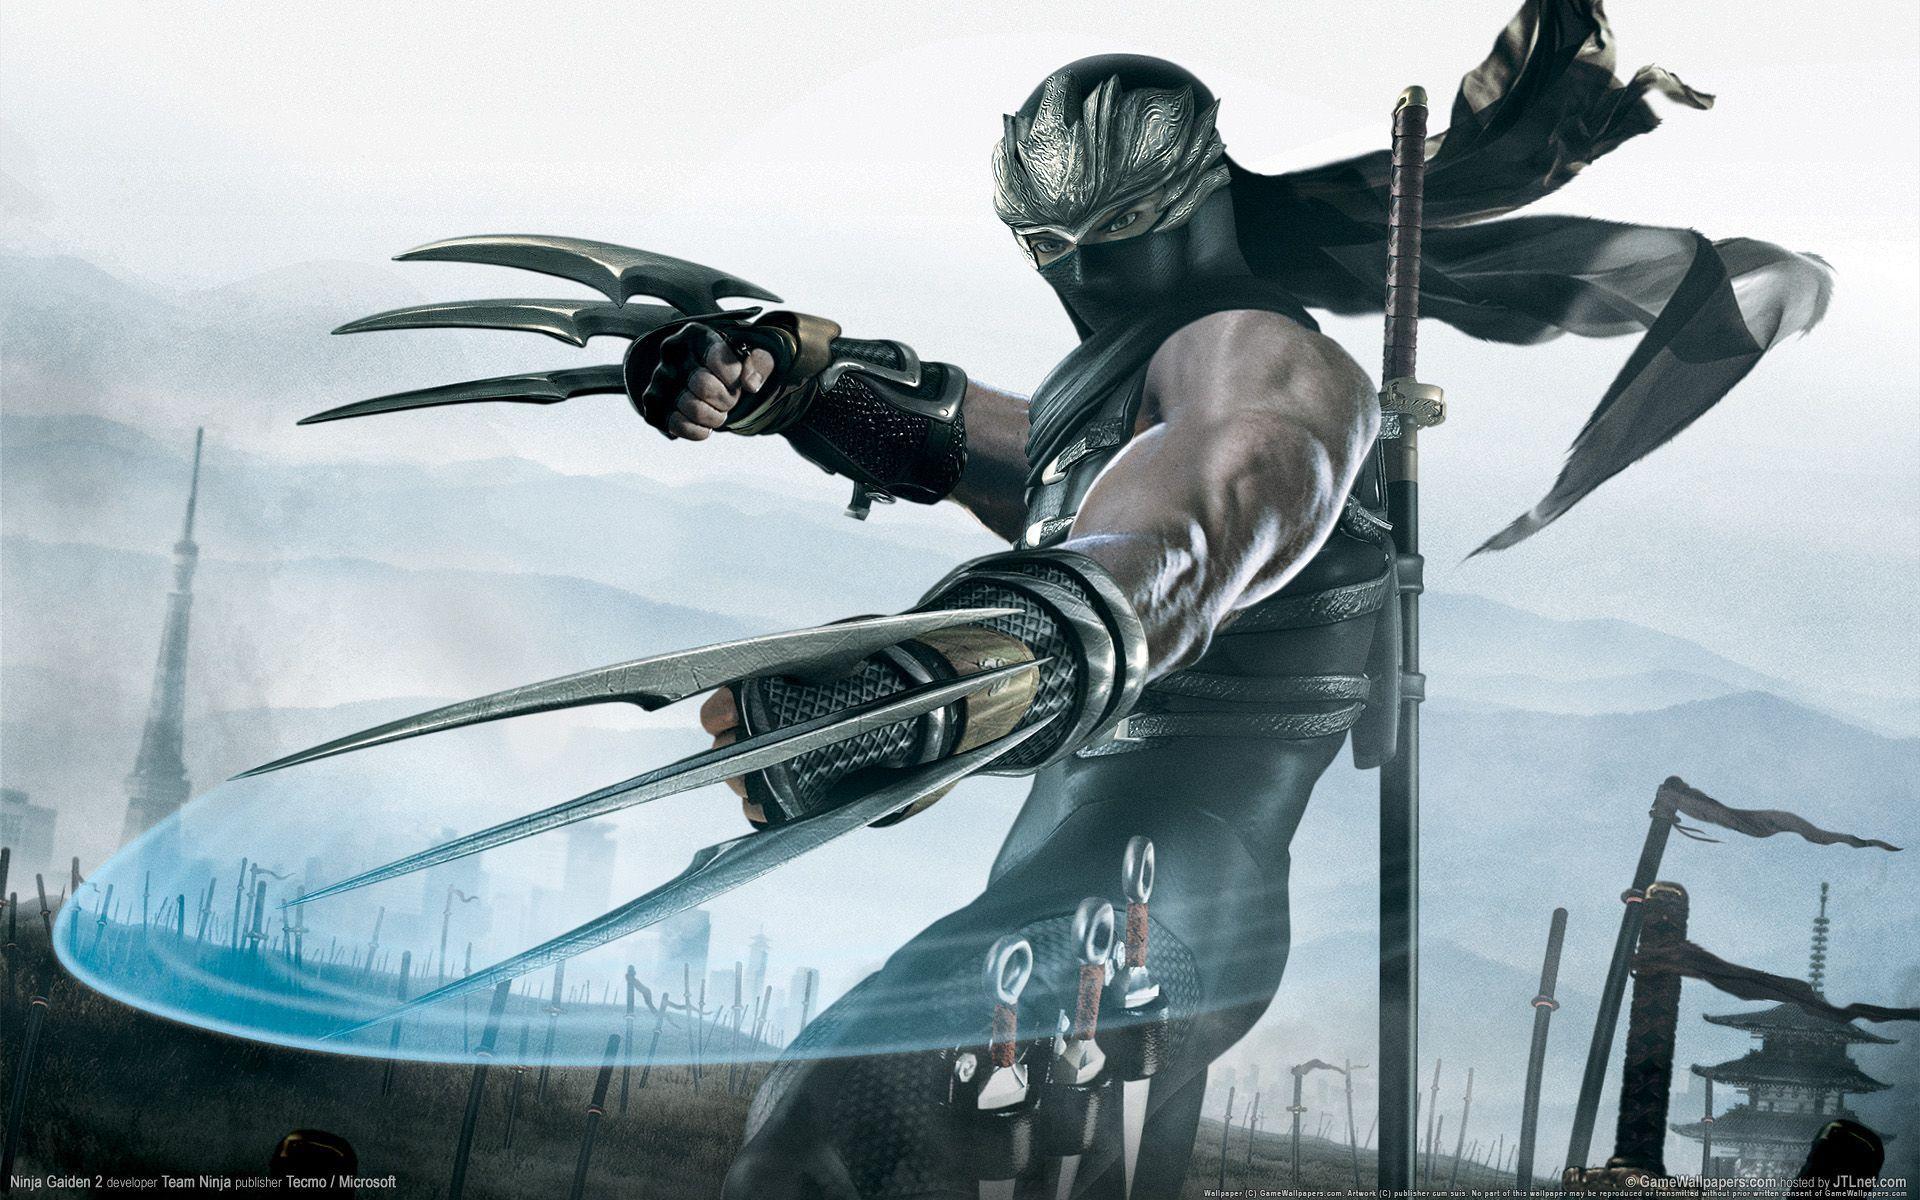 Ninja Assassin Backgrounds on Wallpapers Vista